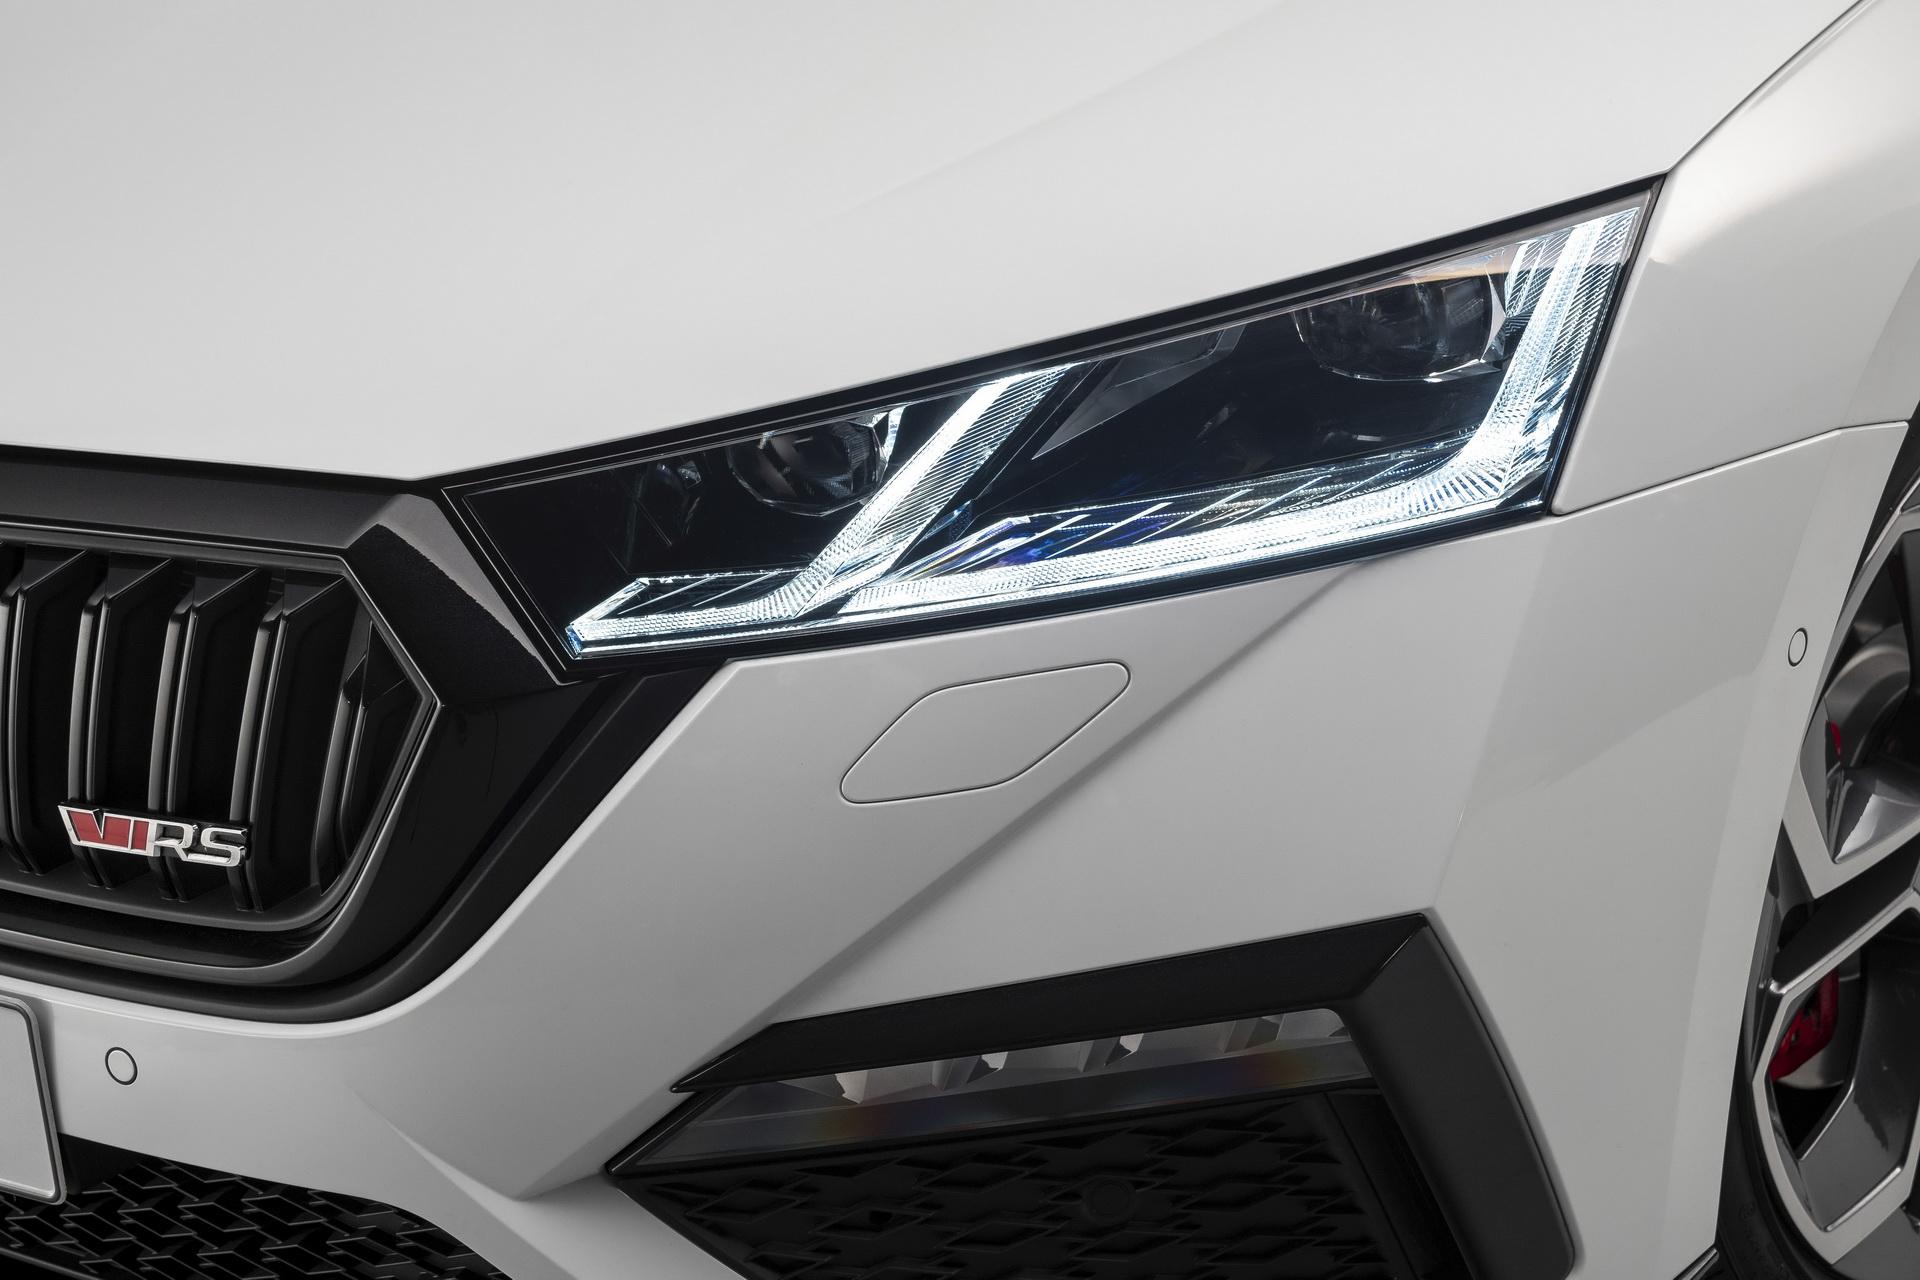 Skoda Octavia RS iV 2020